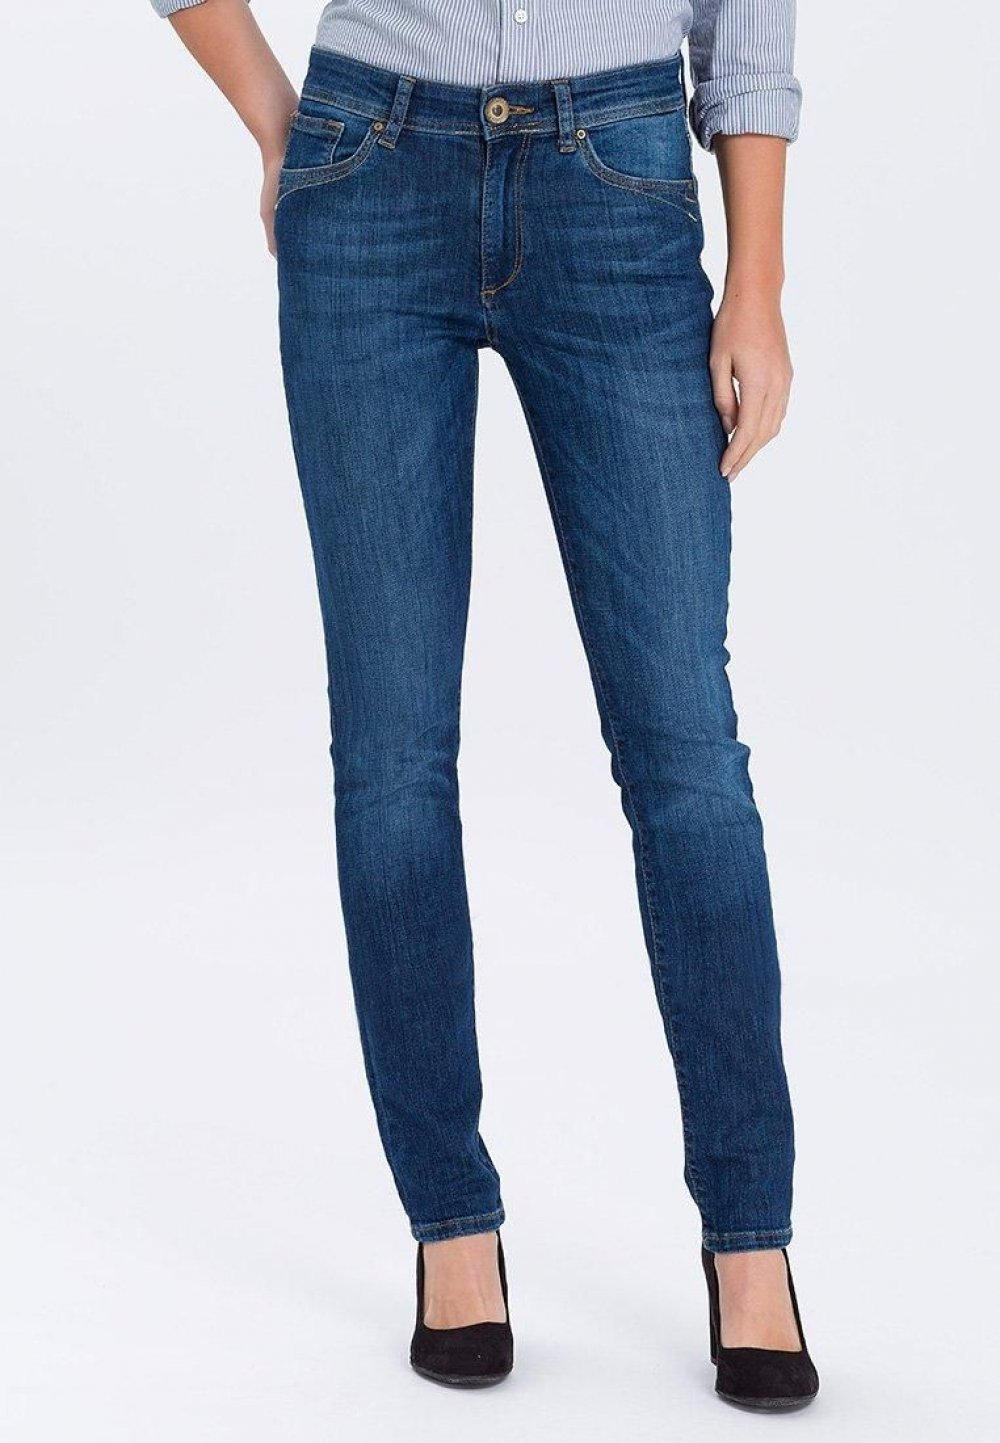 Jeans Cross High Waist Angebot Anya Slim Fit